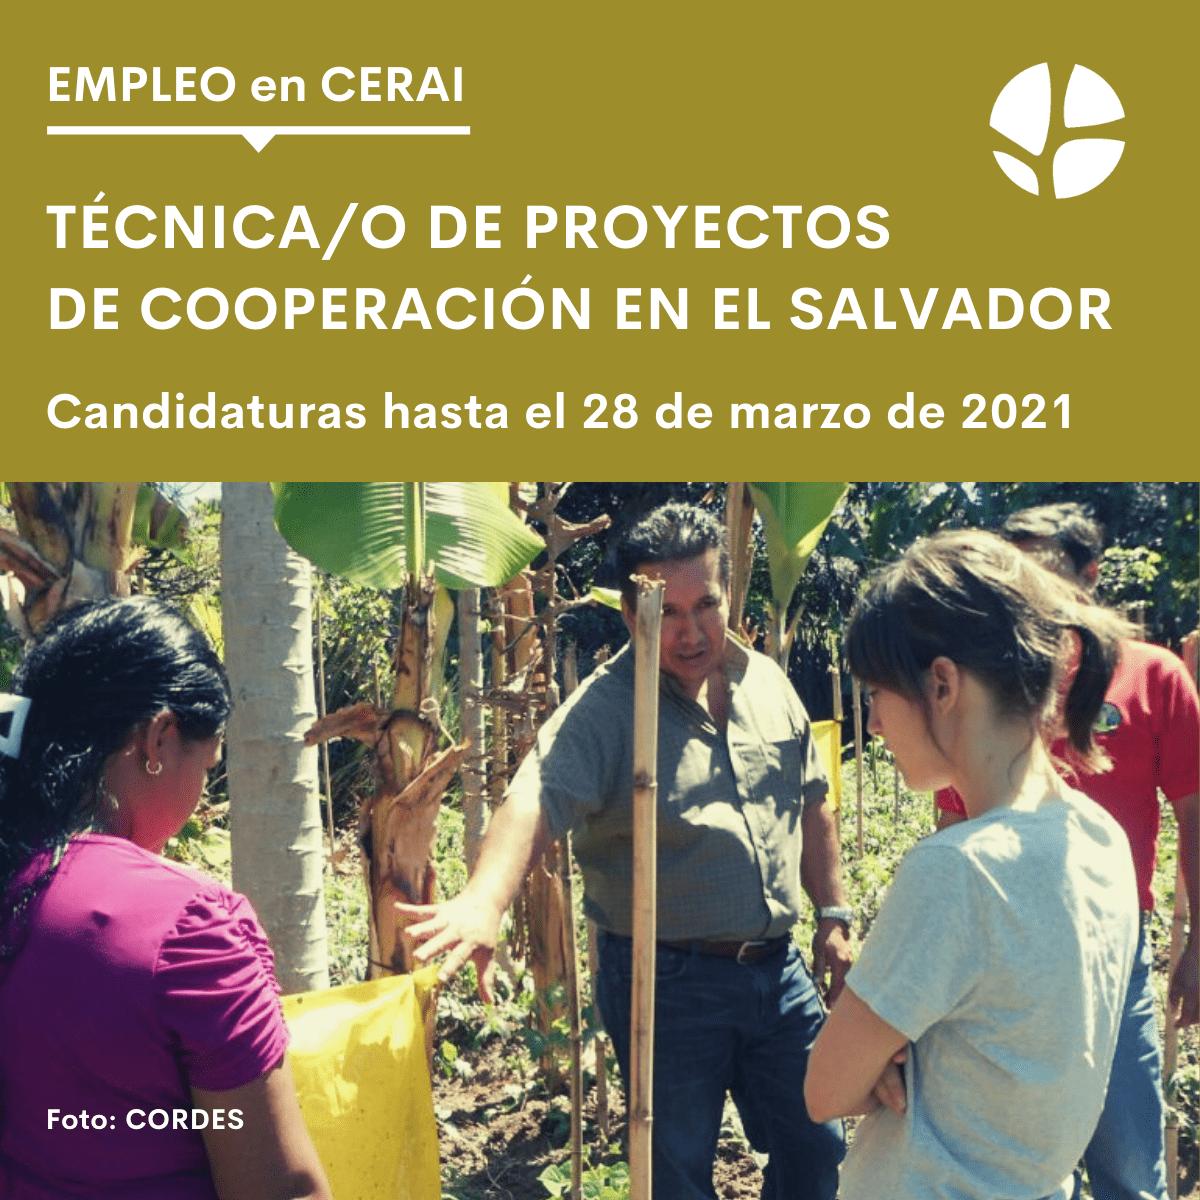 Oferta de empleo: Técnica/o de proyectos para CERAI en El Salvador